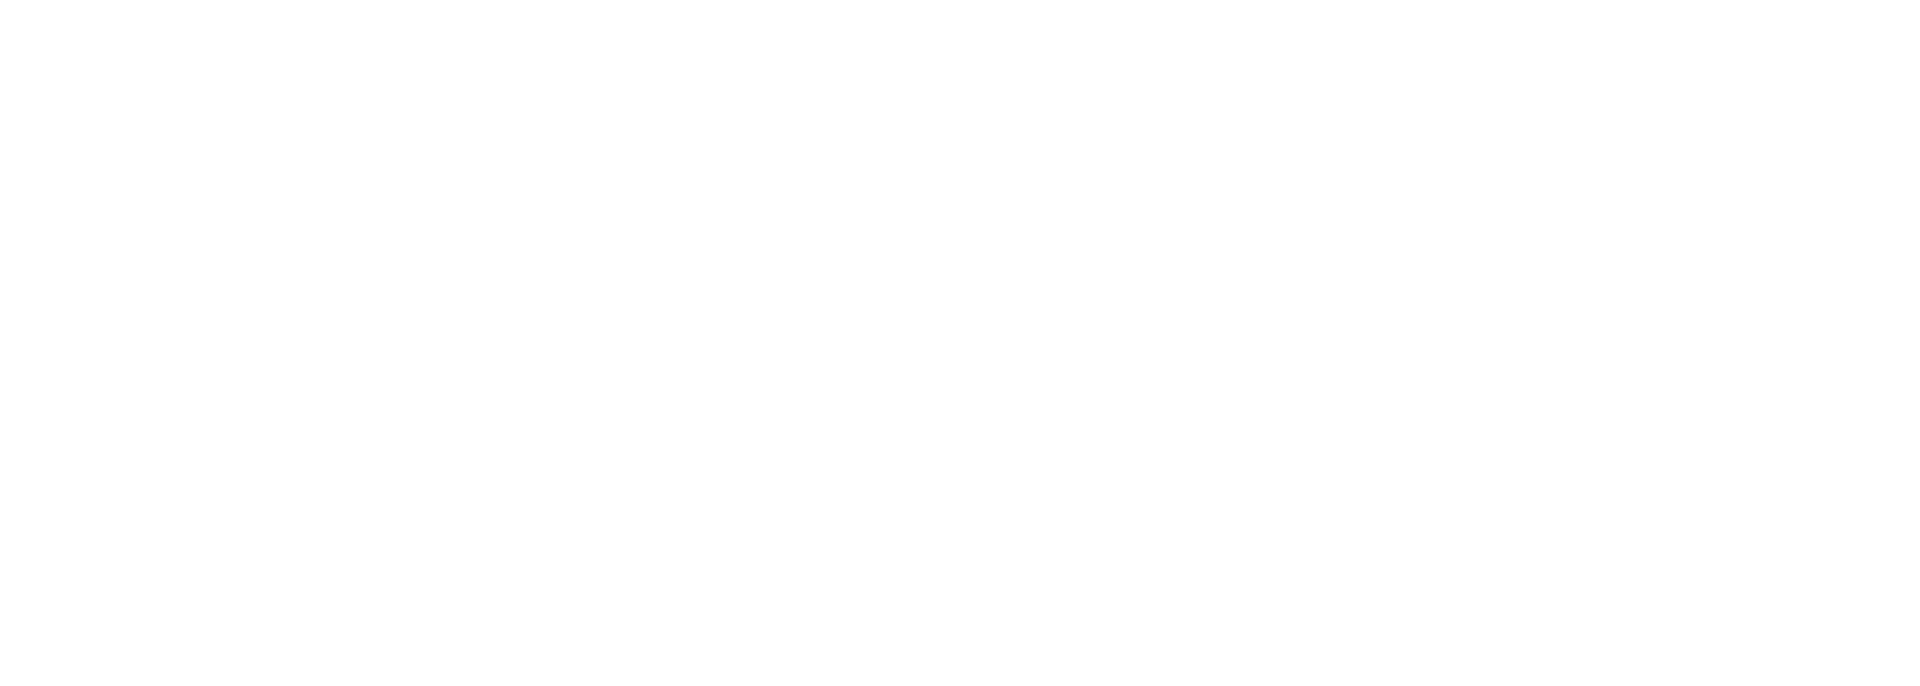 wella-bg1920